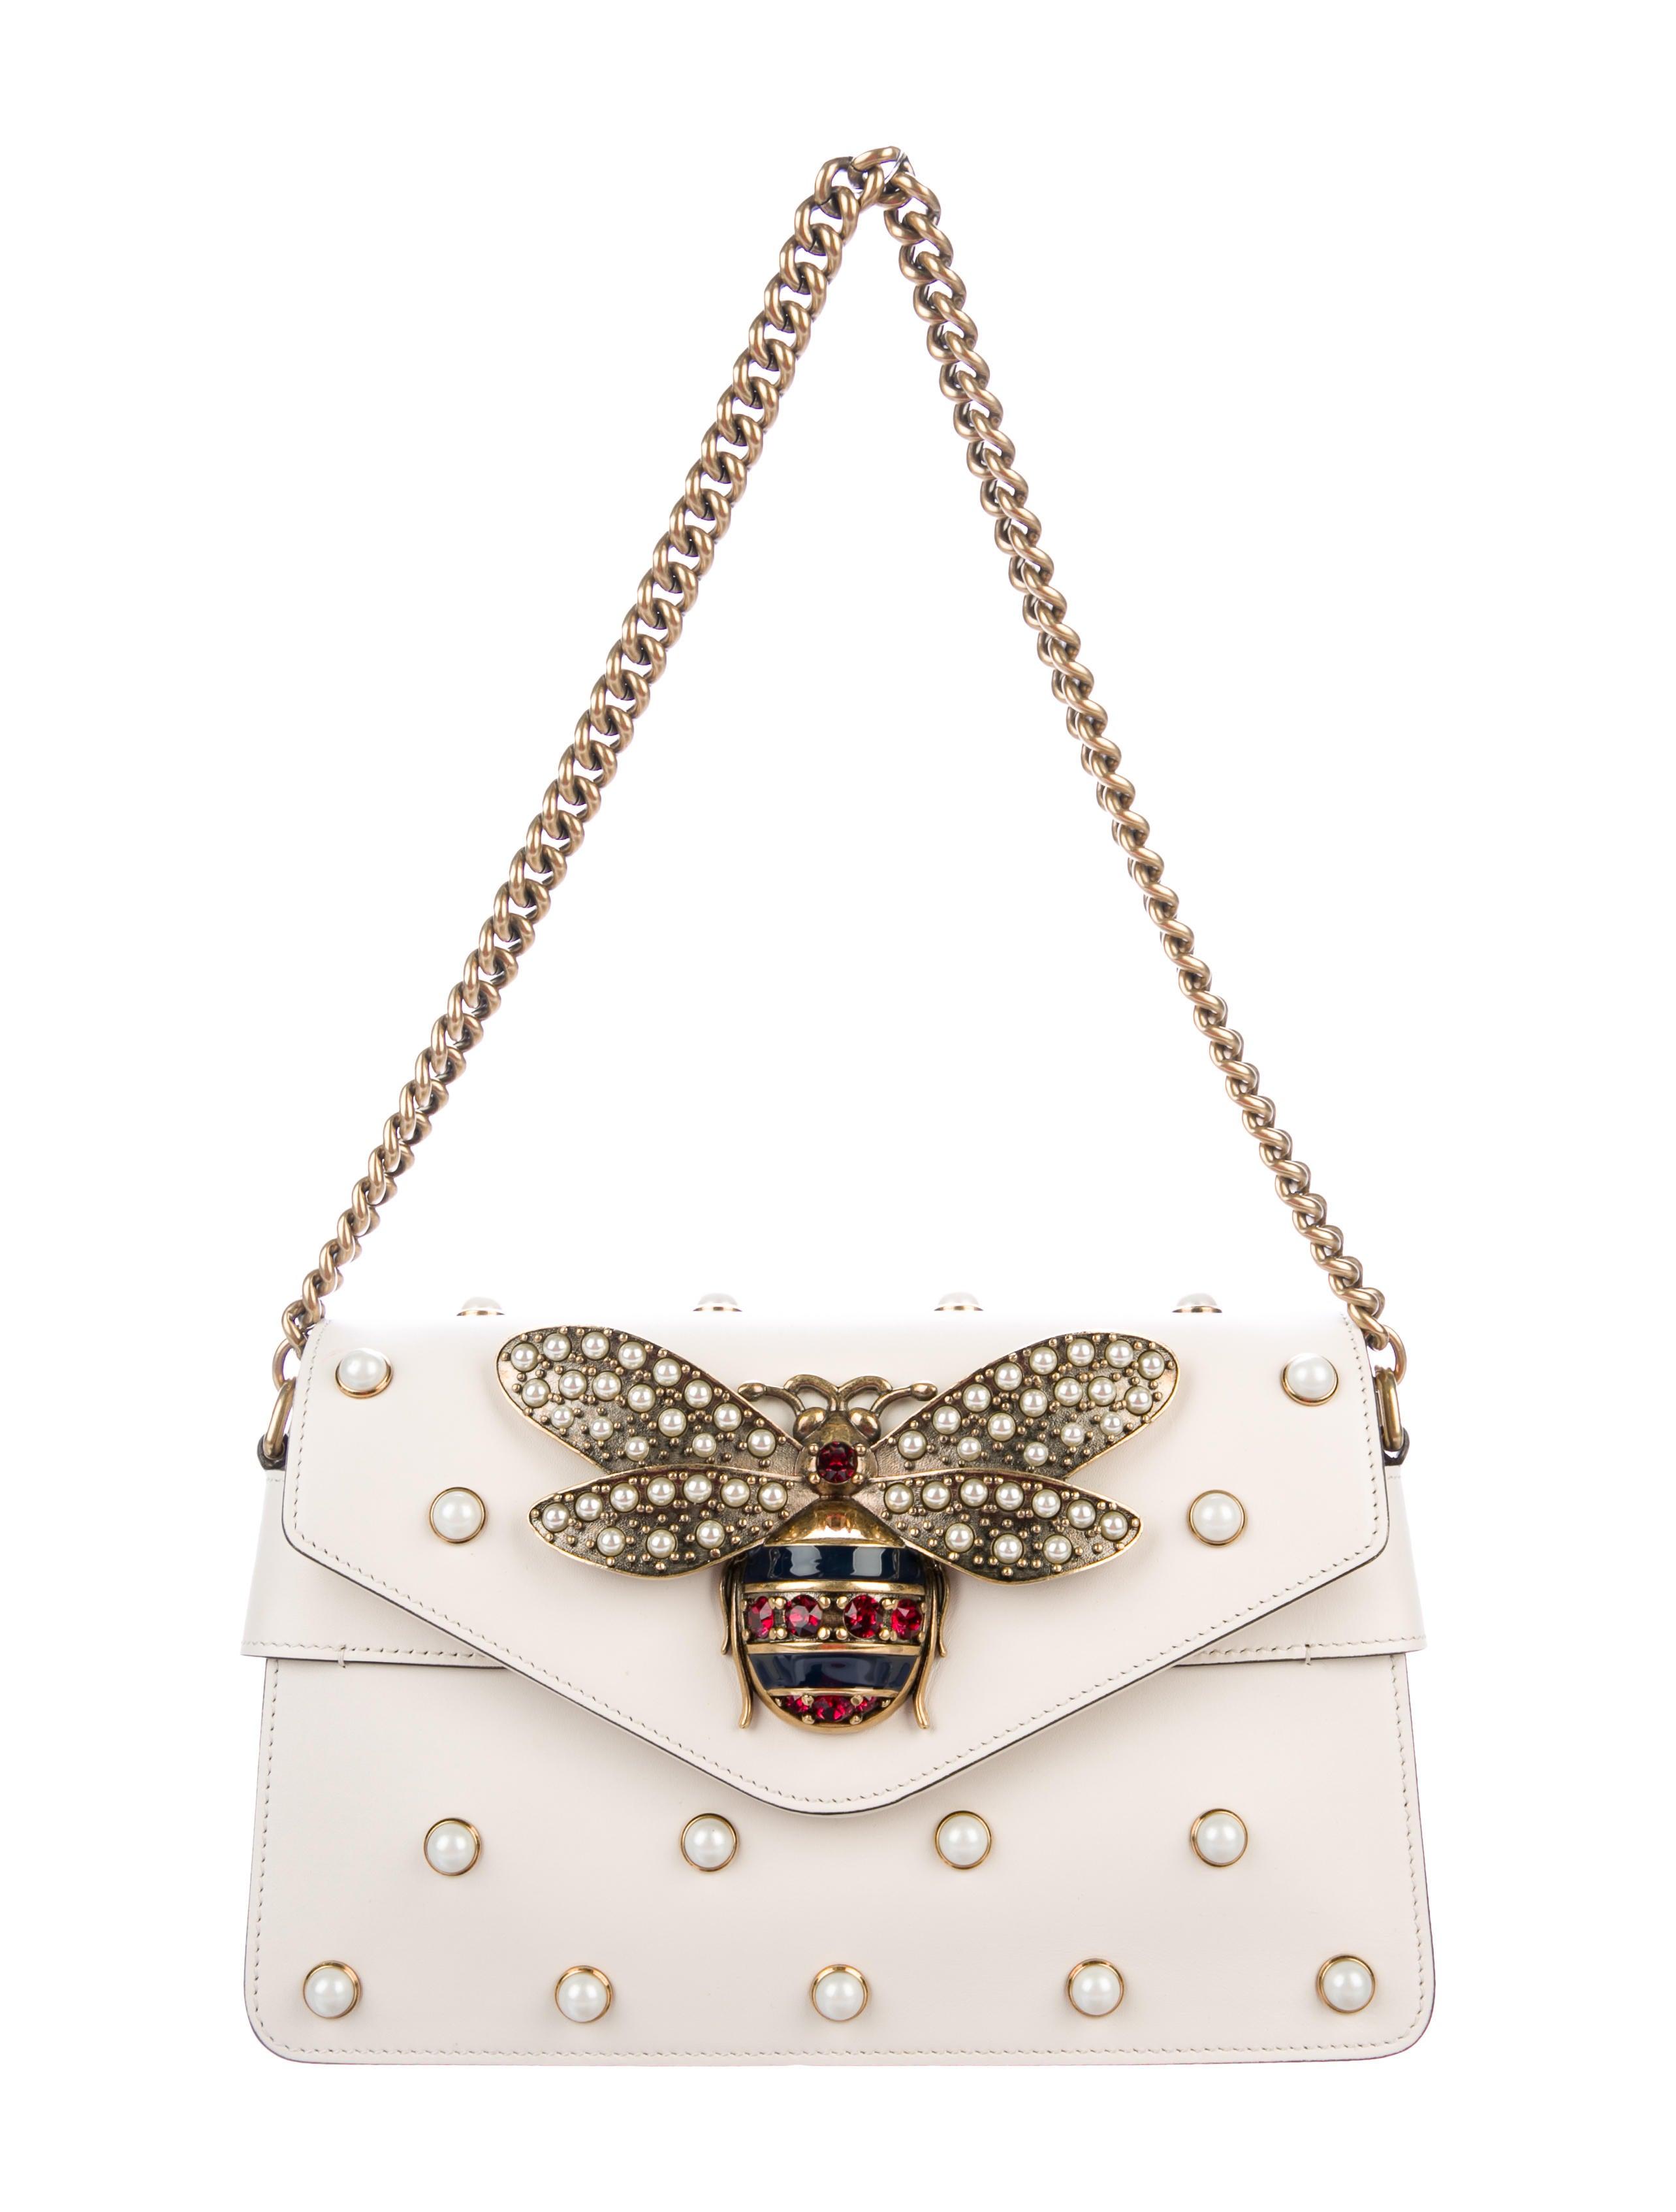 c9456e000d1b Gucci Broadway Leather Mini Bag - Handbags - GUC209539 | The RealReal